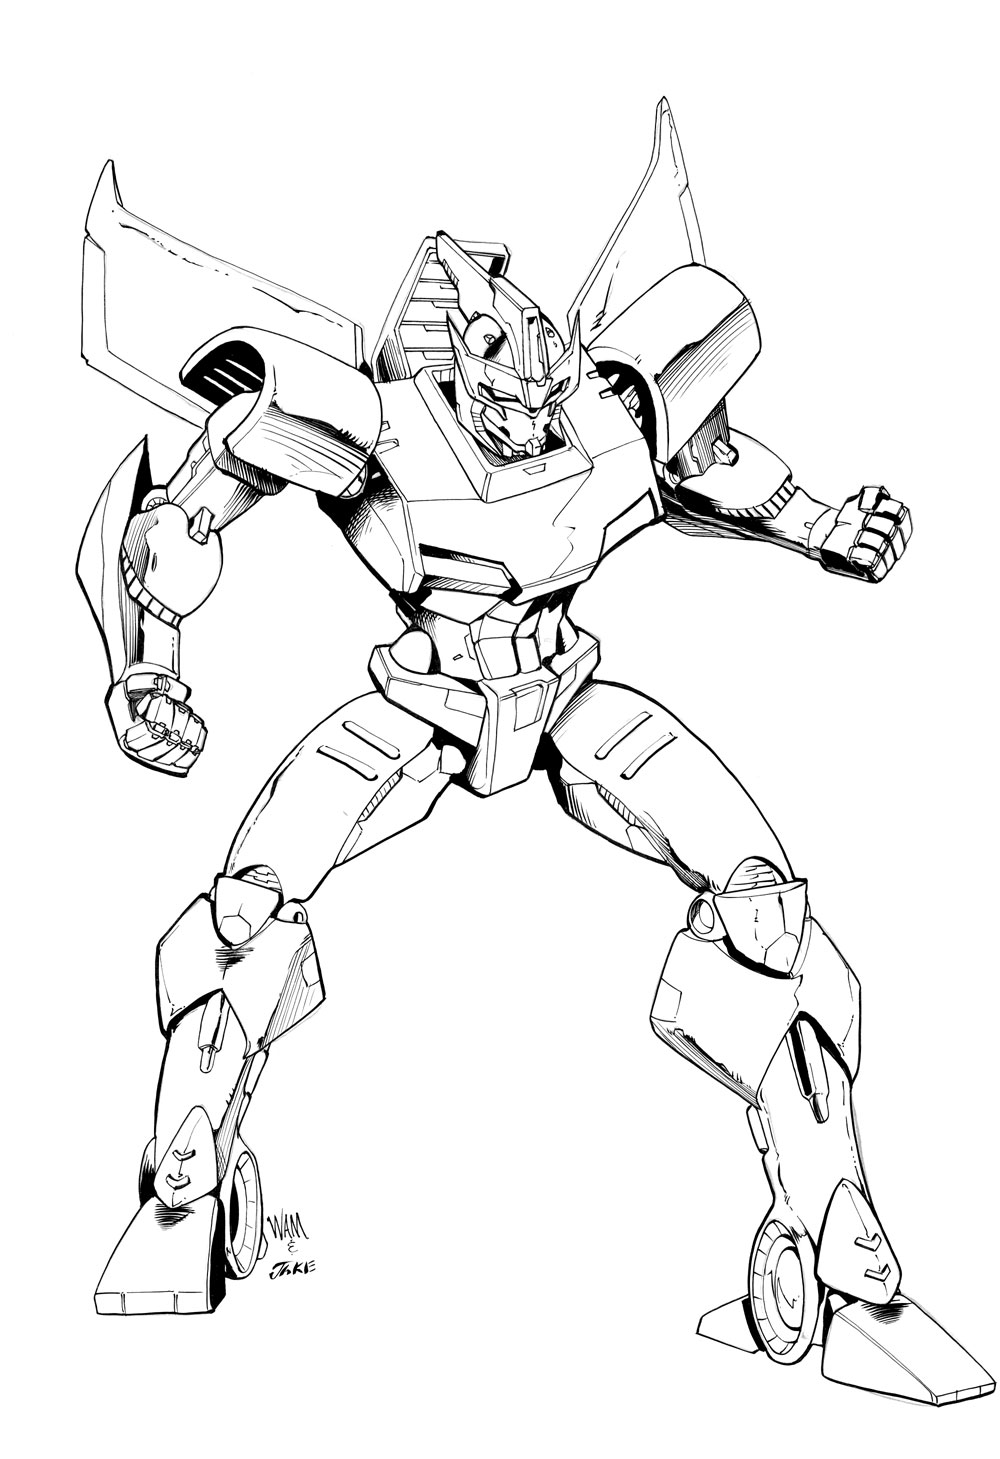 transtech prowl by inker guy on deviantart